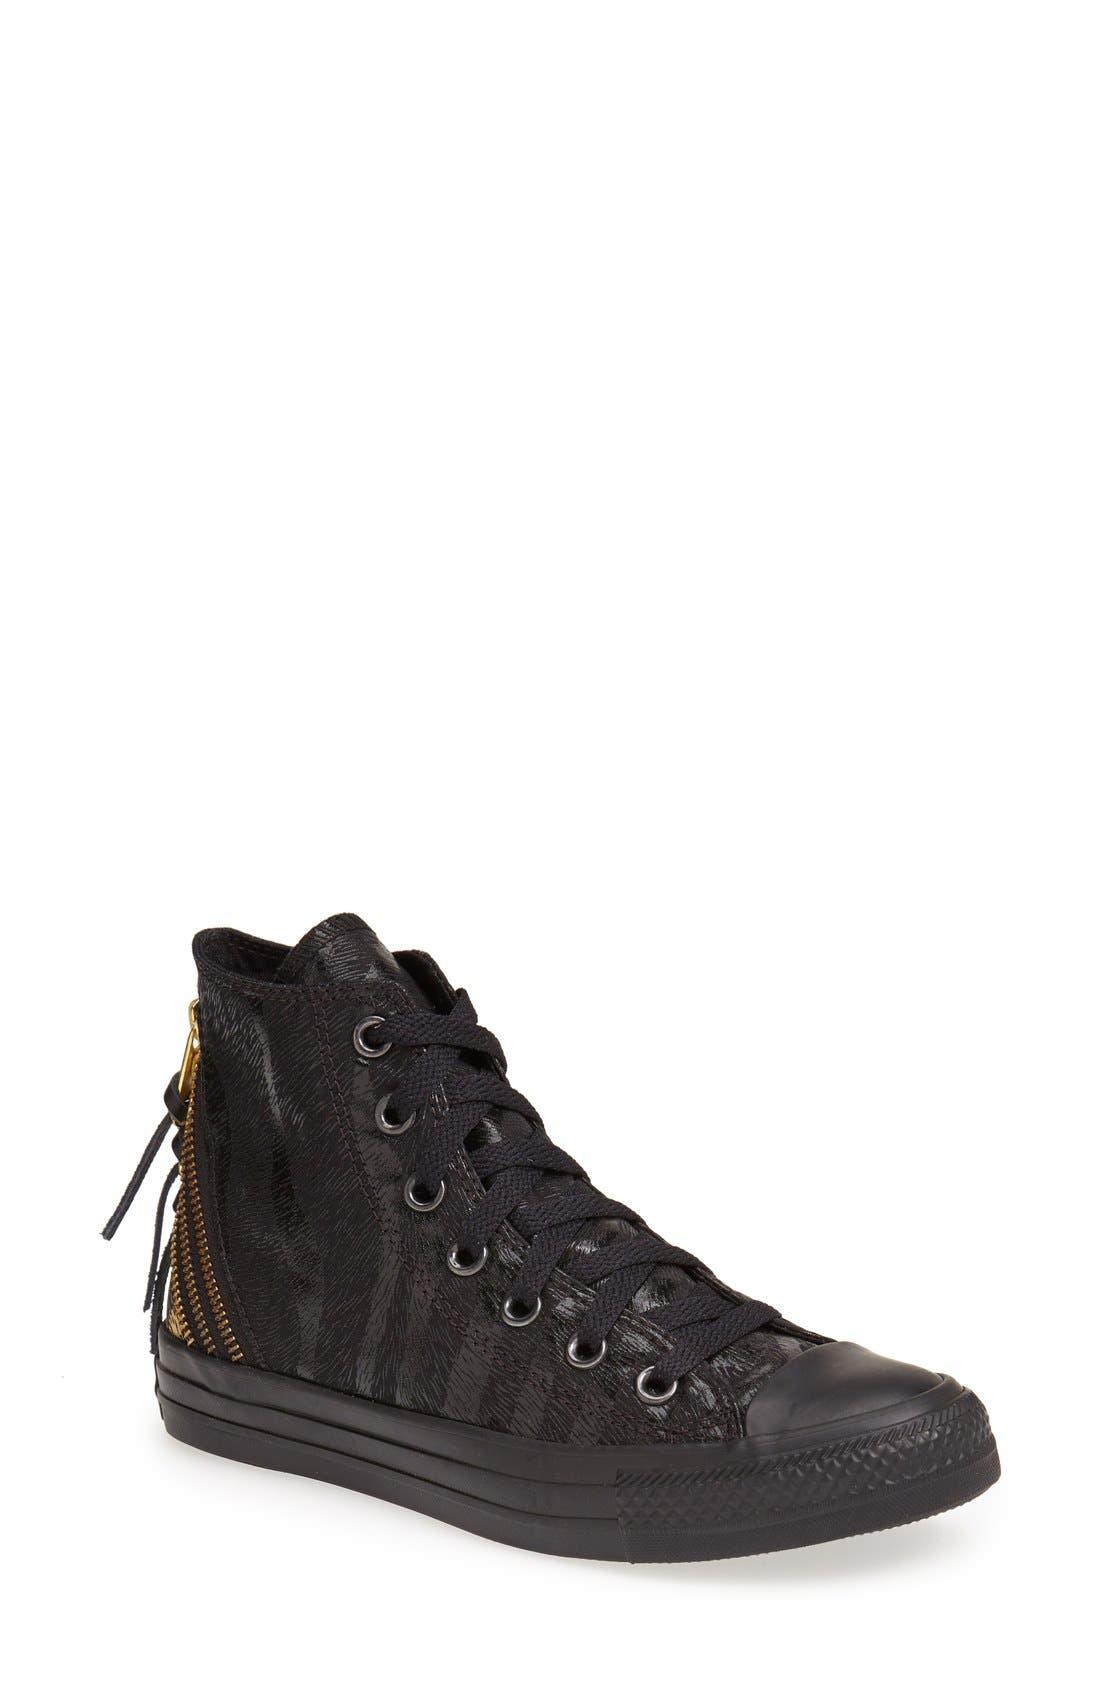 Alternate Image 1 Selected - Converse Chuck Taylor® All Star® 'Tri Zip' High Top Sneaker (Women)